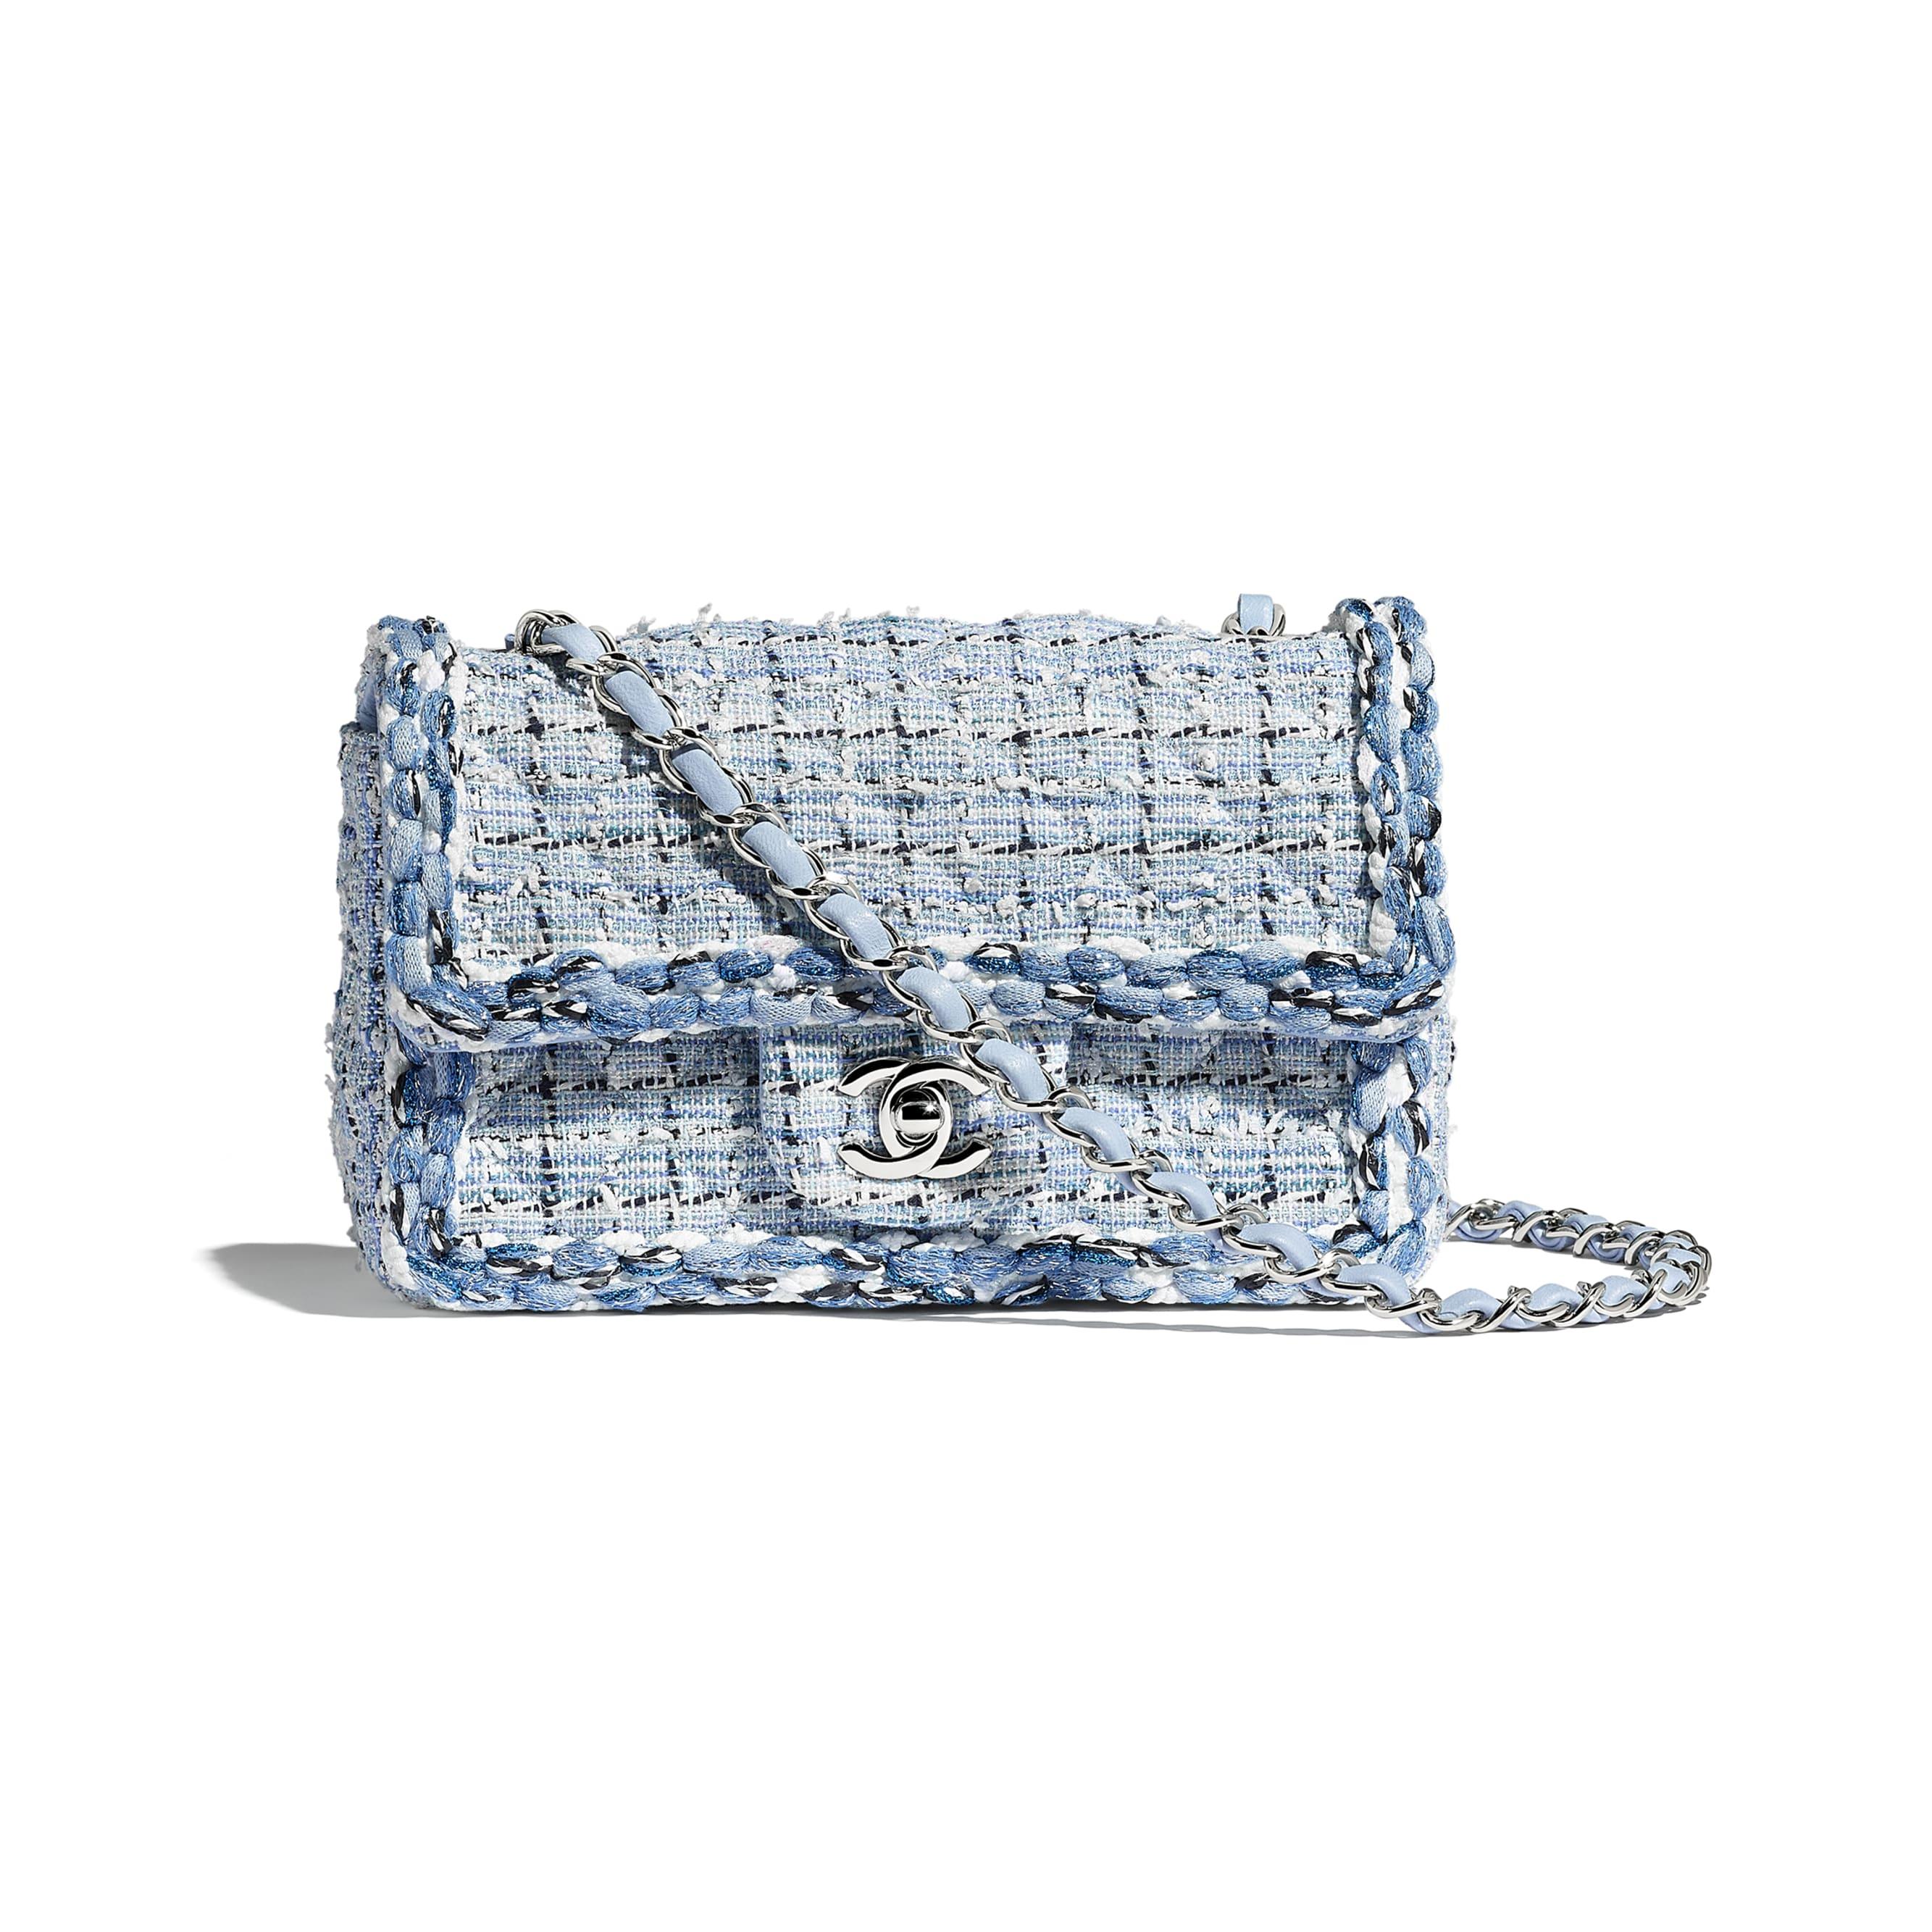 Mini Flap Bag - Blue & White - Tweed, Braid & Silver-Tone Metal - Default view - see standard sized version